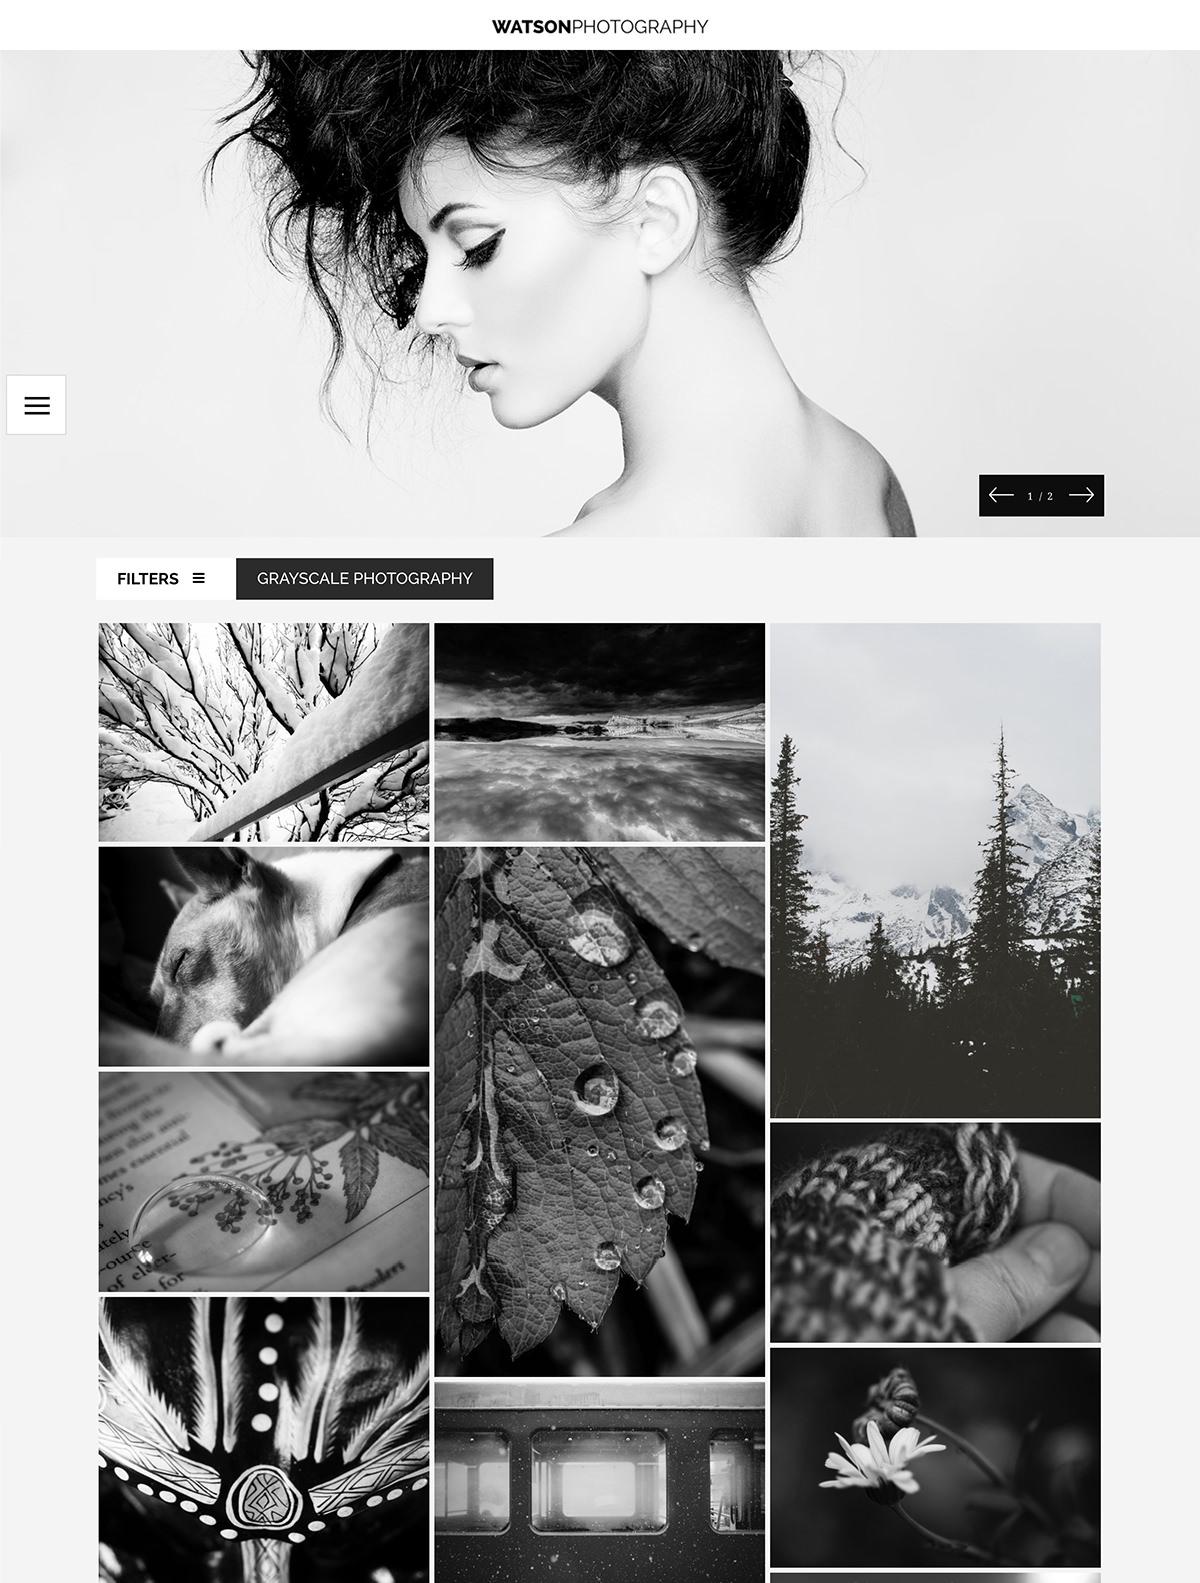 Watson photography theme with slider and portfolio.